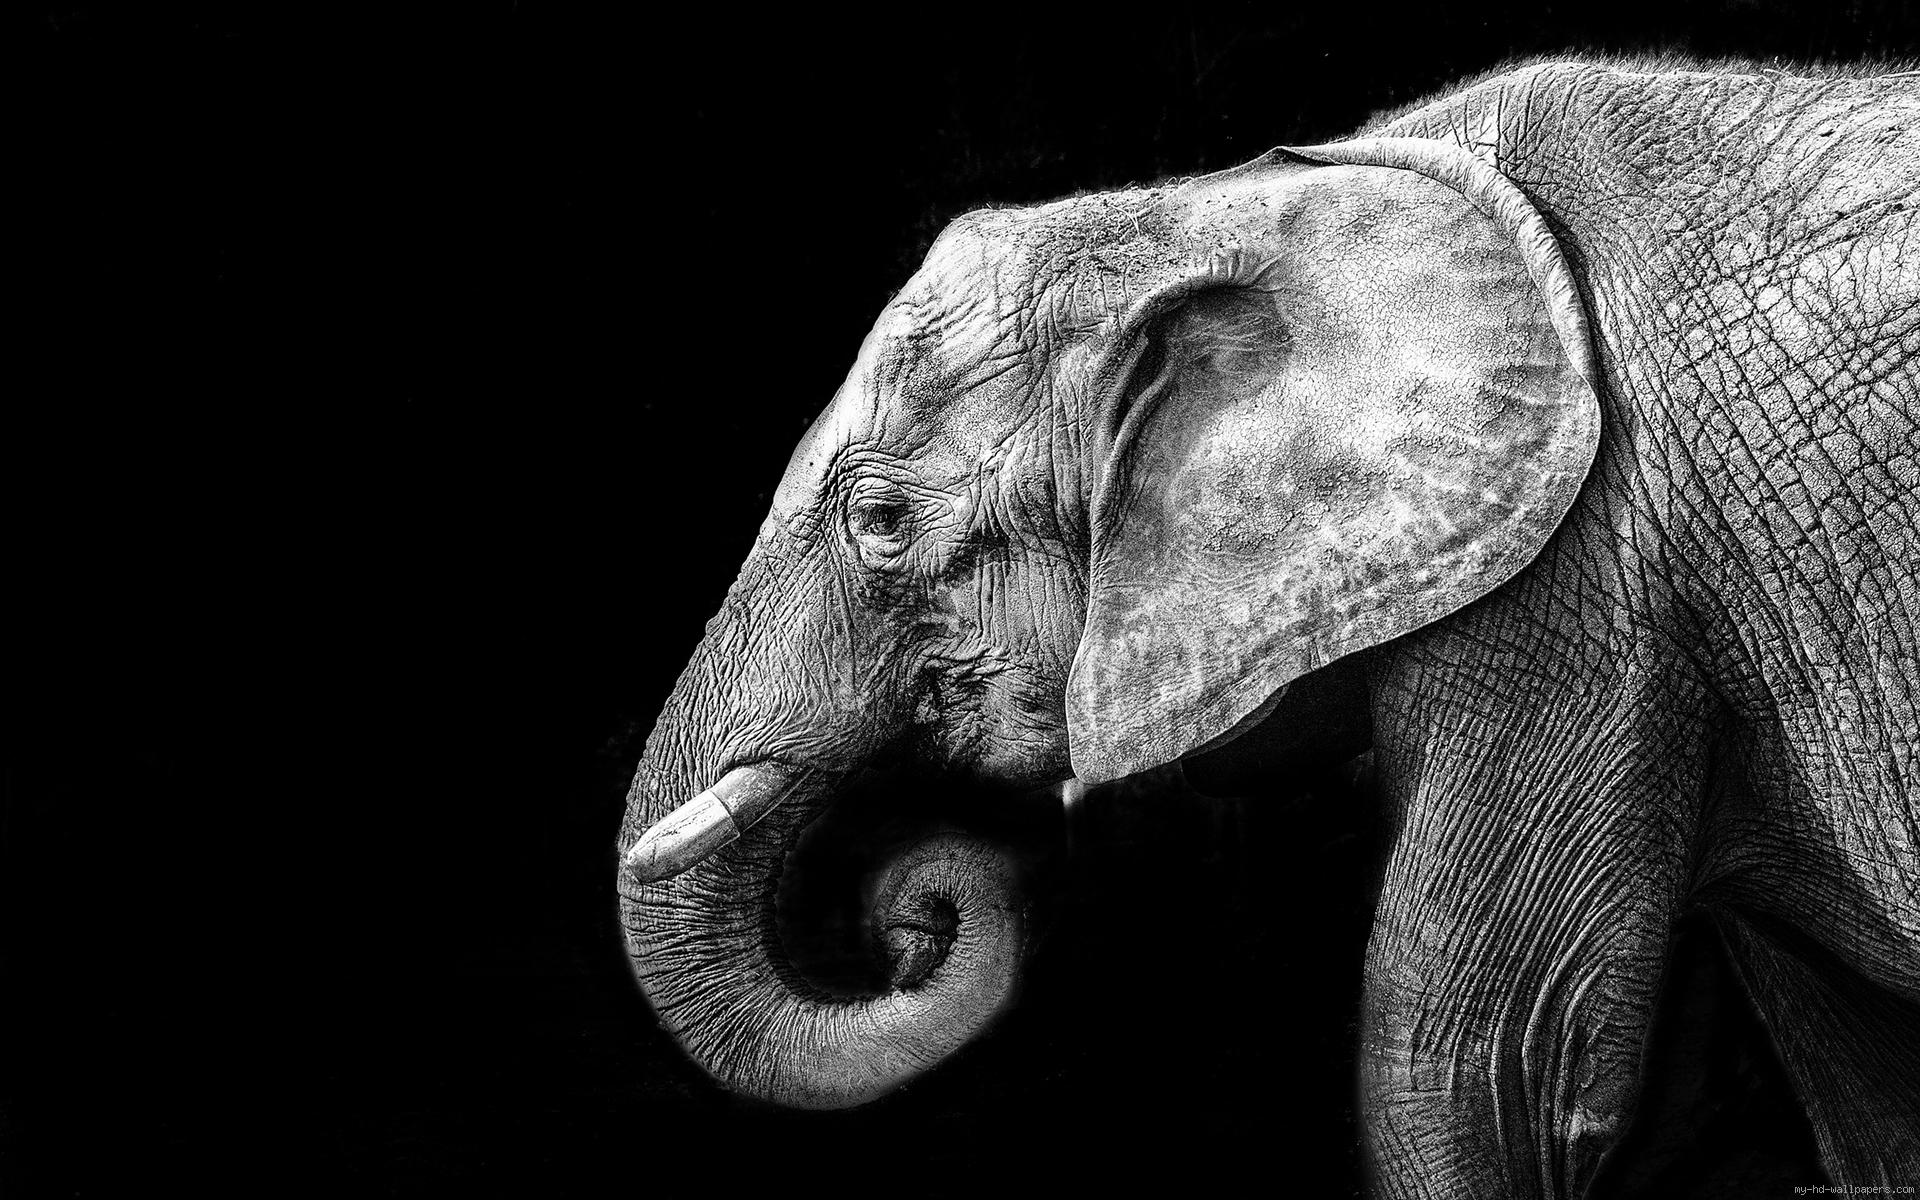 Elefante Wallpaper Black And White Elephant Background